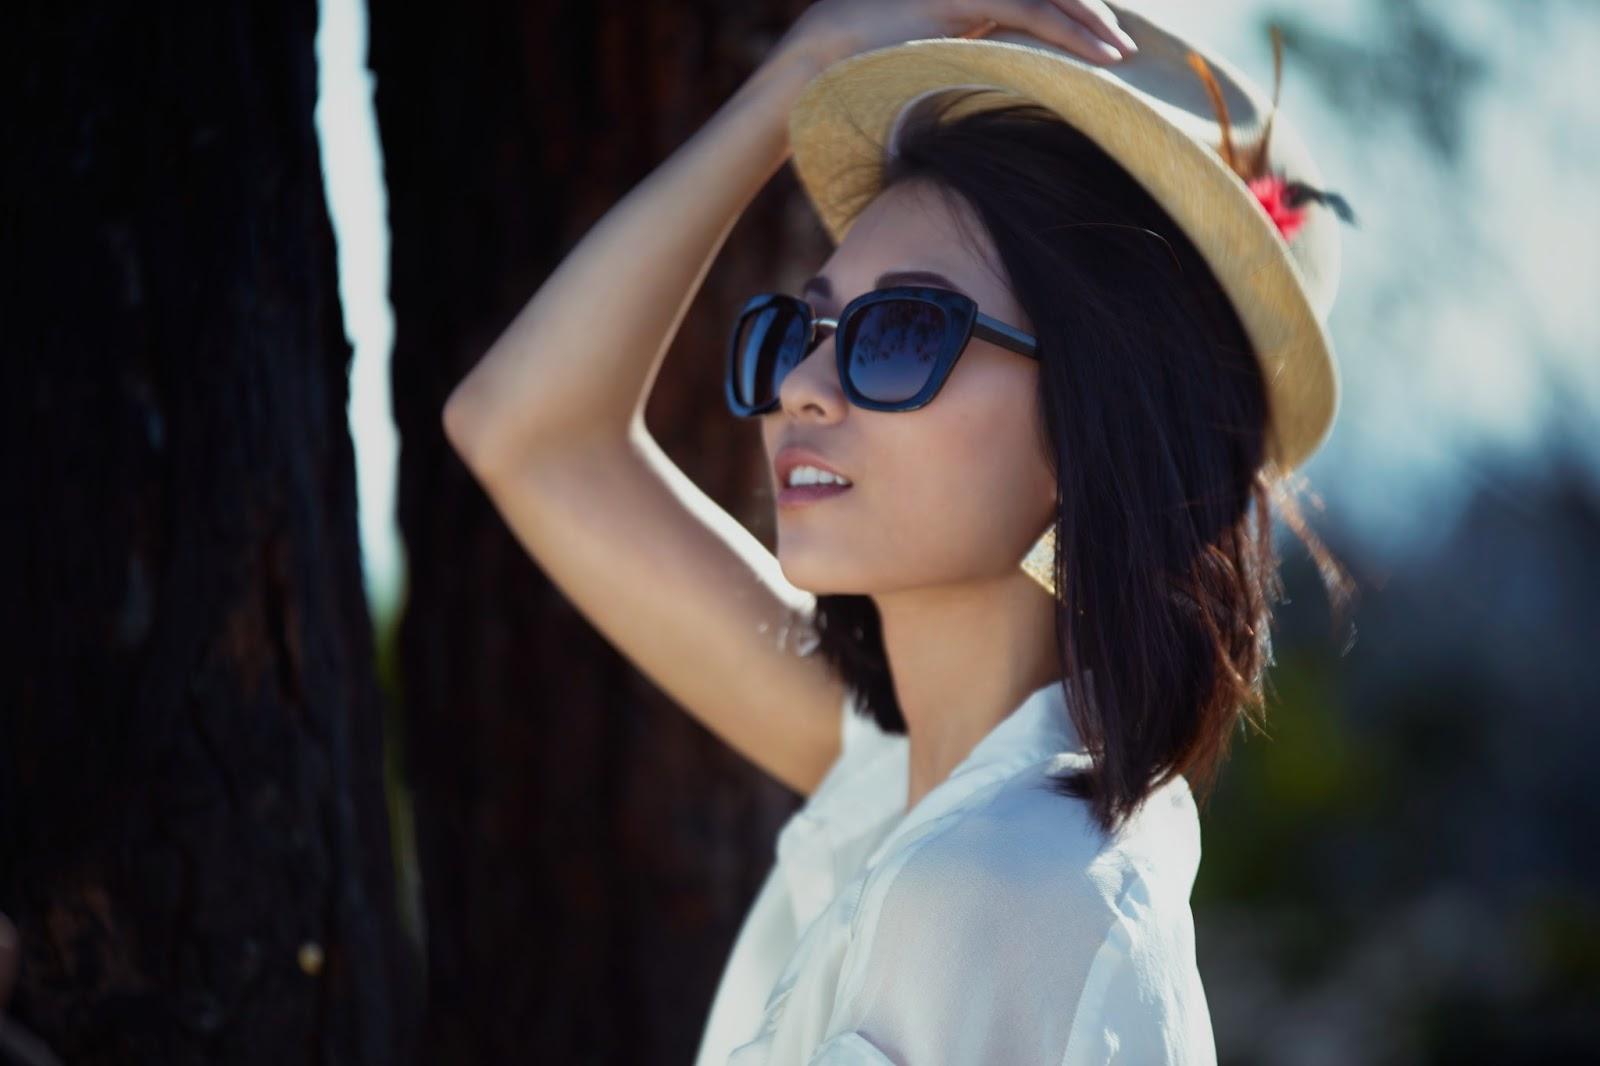 Refreshing-Silk-eunique-kollection-stylist-freelance-creative-top-fashion-blogger-kaii-shopkaii-silk-pactography-7